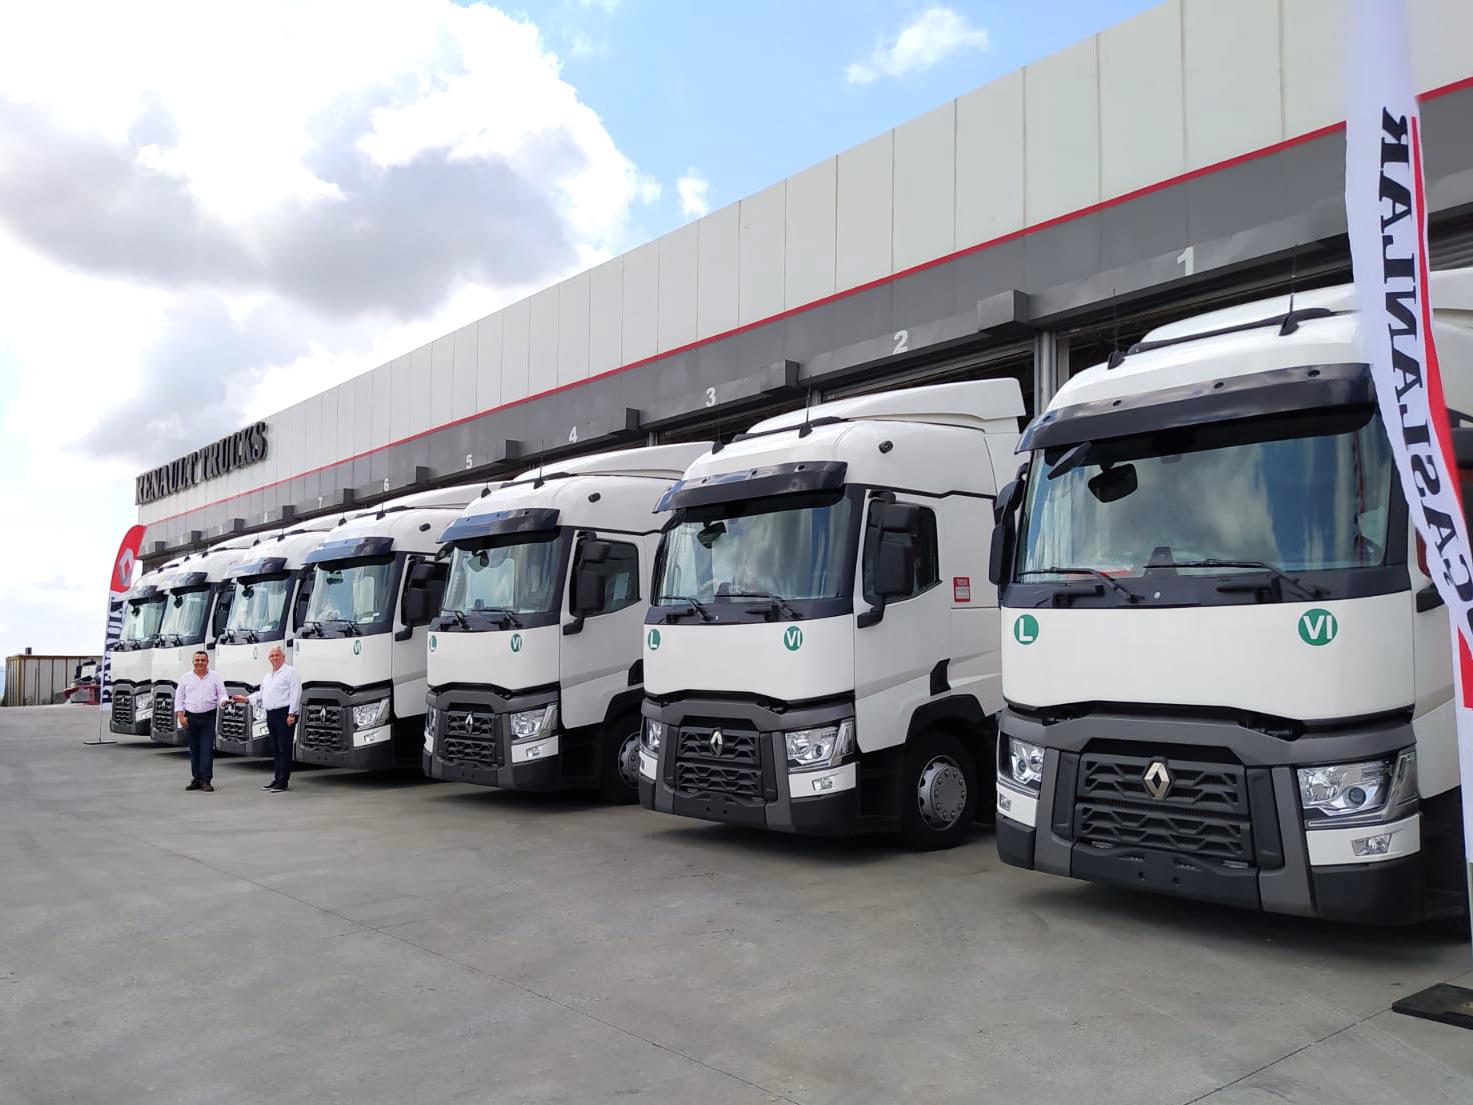 1595329652_renault_trucks_kare_karayolu_teslimat_gorsel_2.jpg